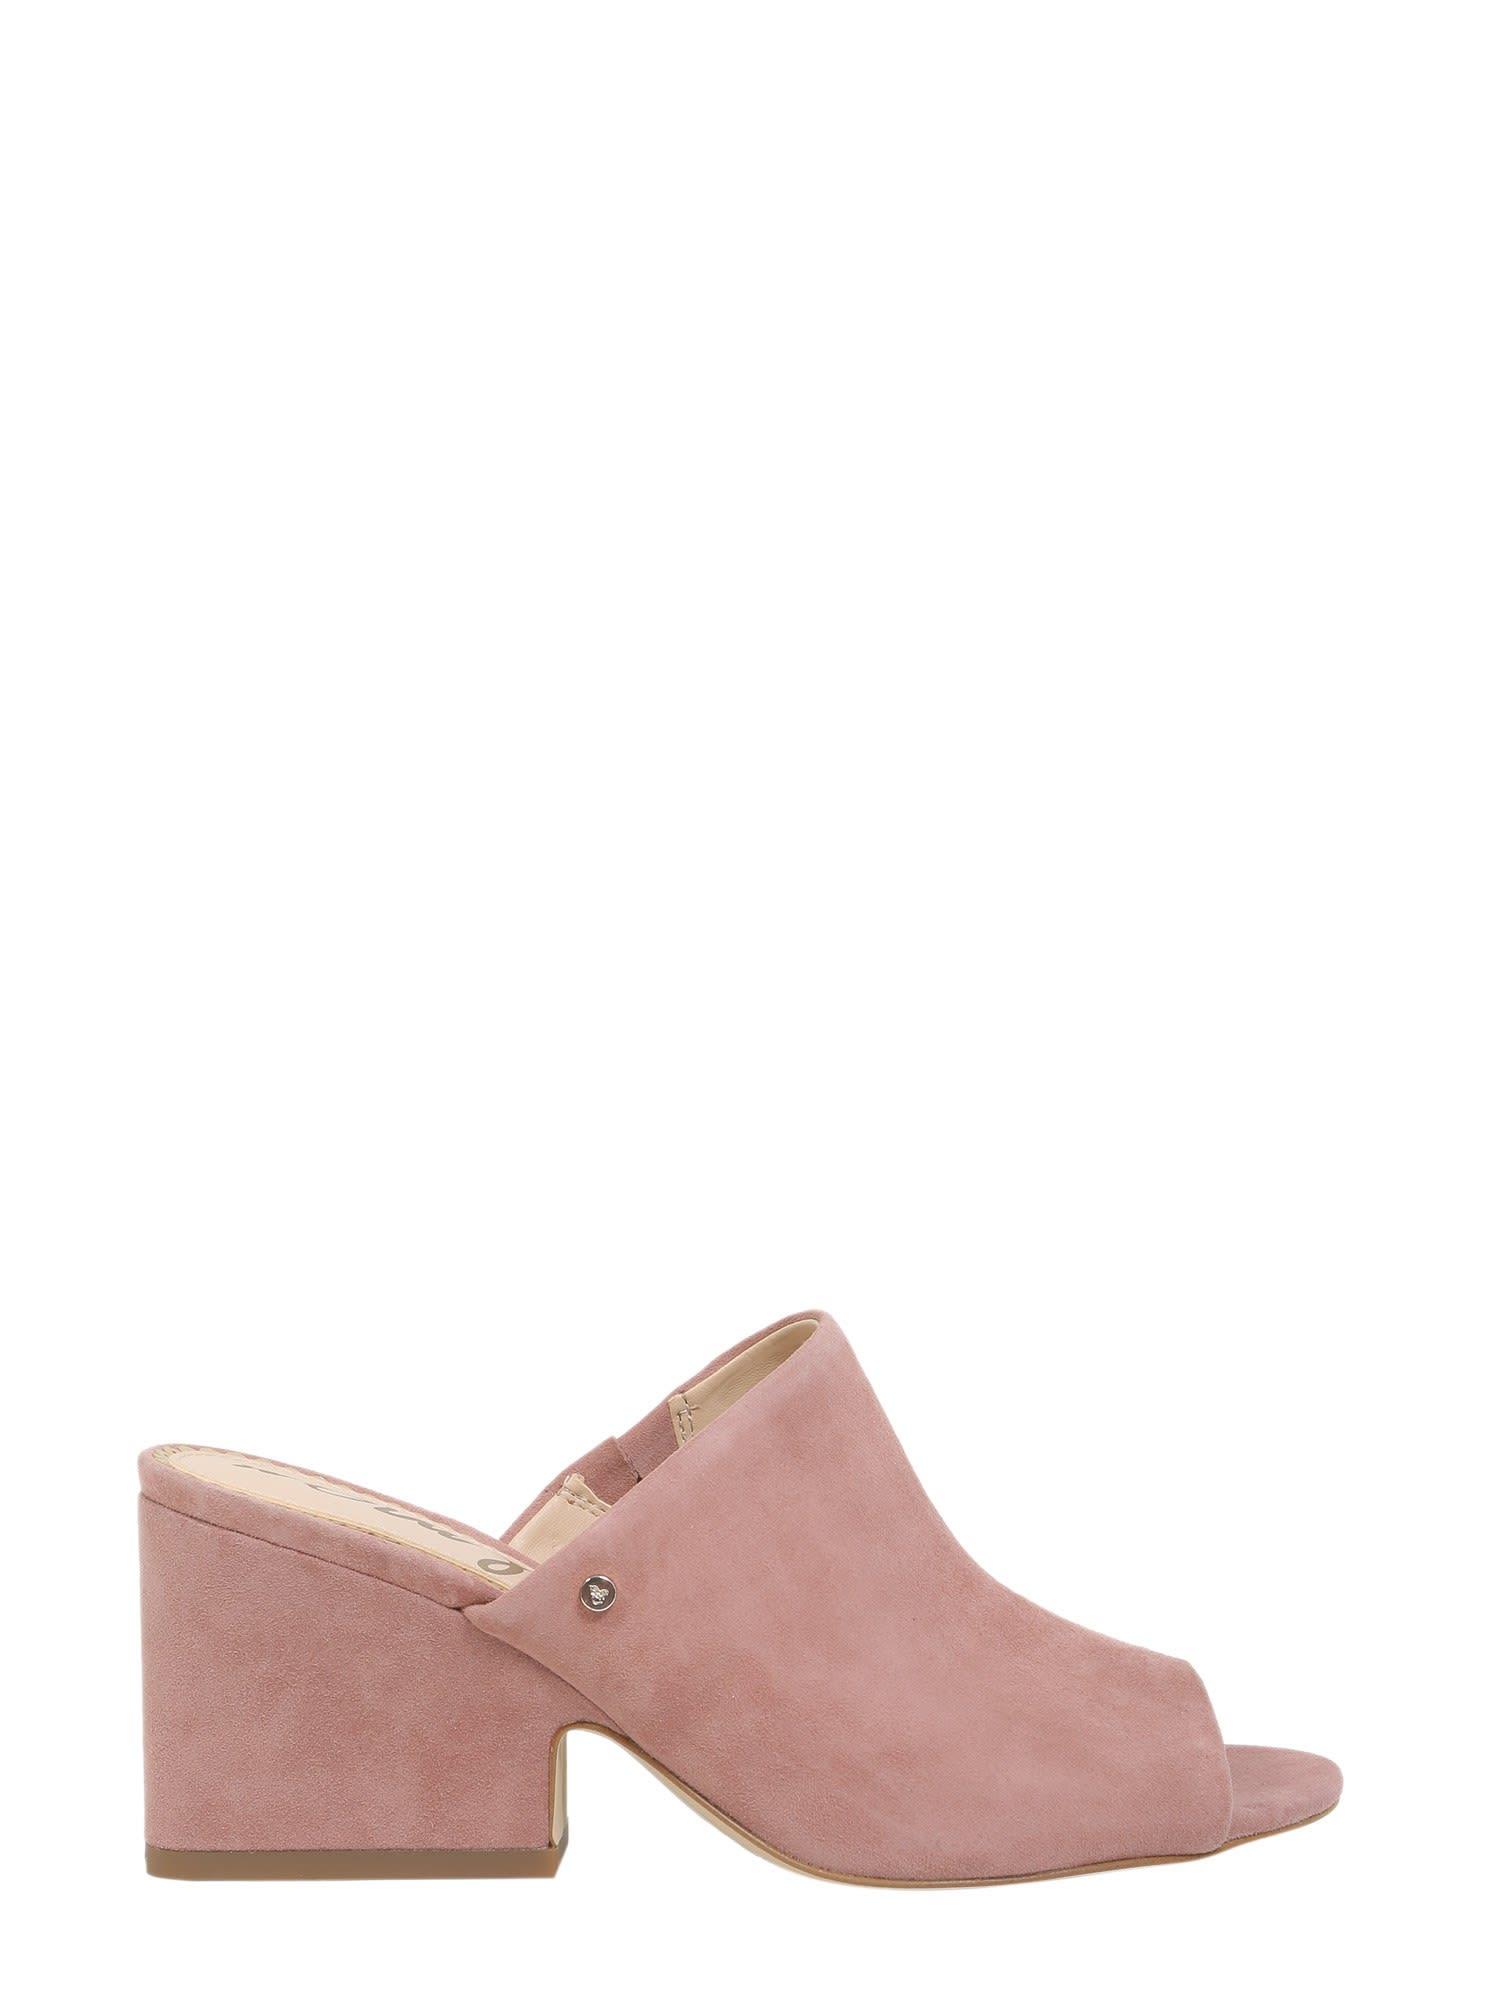 Buy Sam Edelman Rheta Mules Sandals online, shop Sam Edelman shoes with free shipping